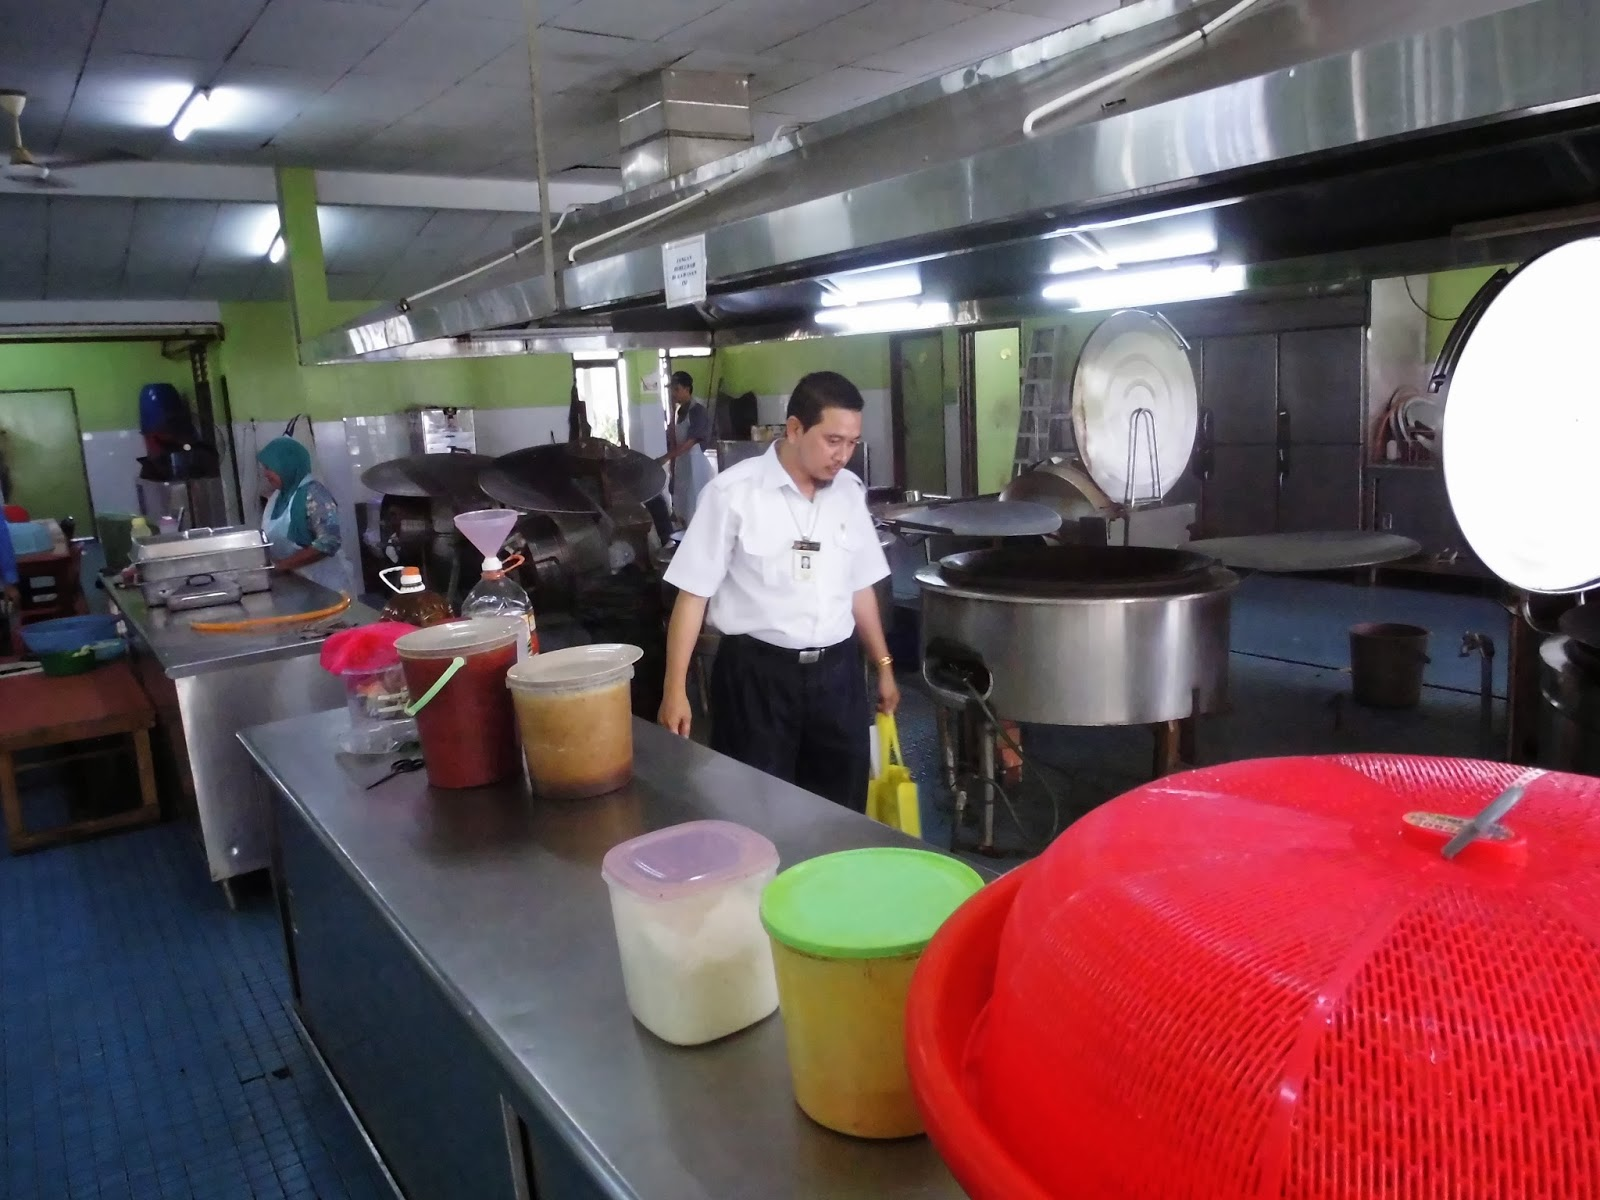 Dapur Kantin Sekolah Desainrumahid